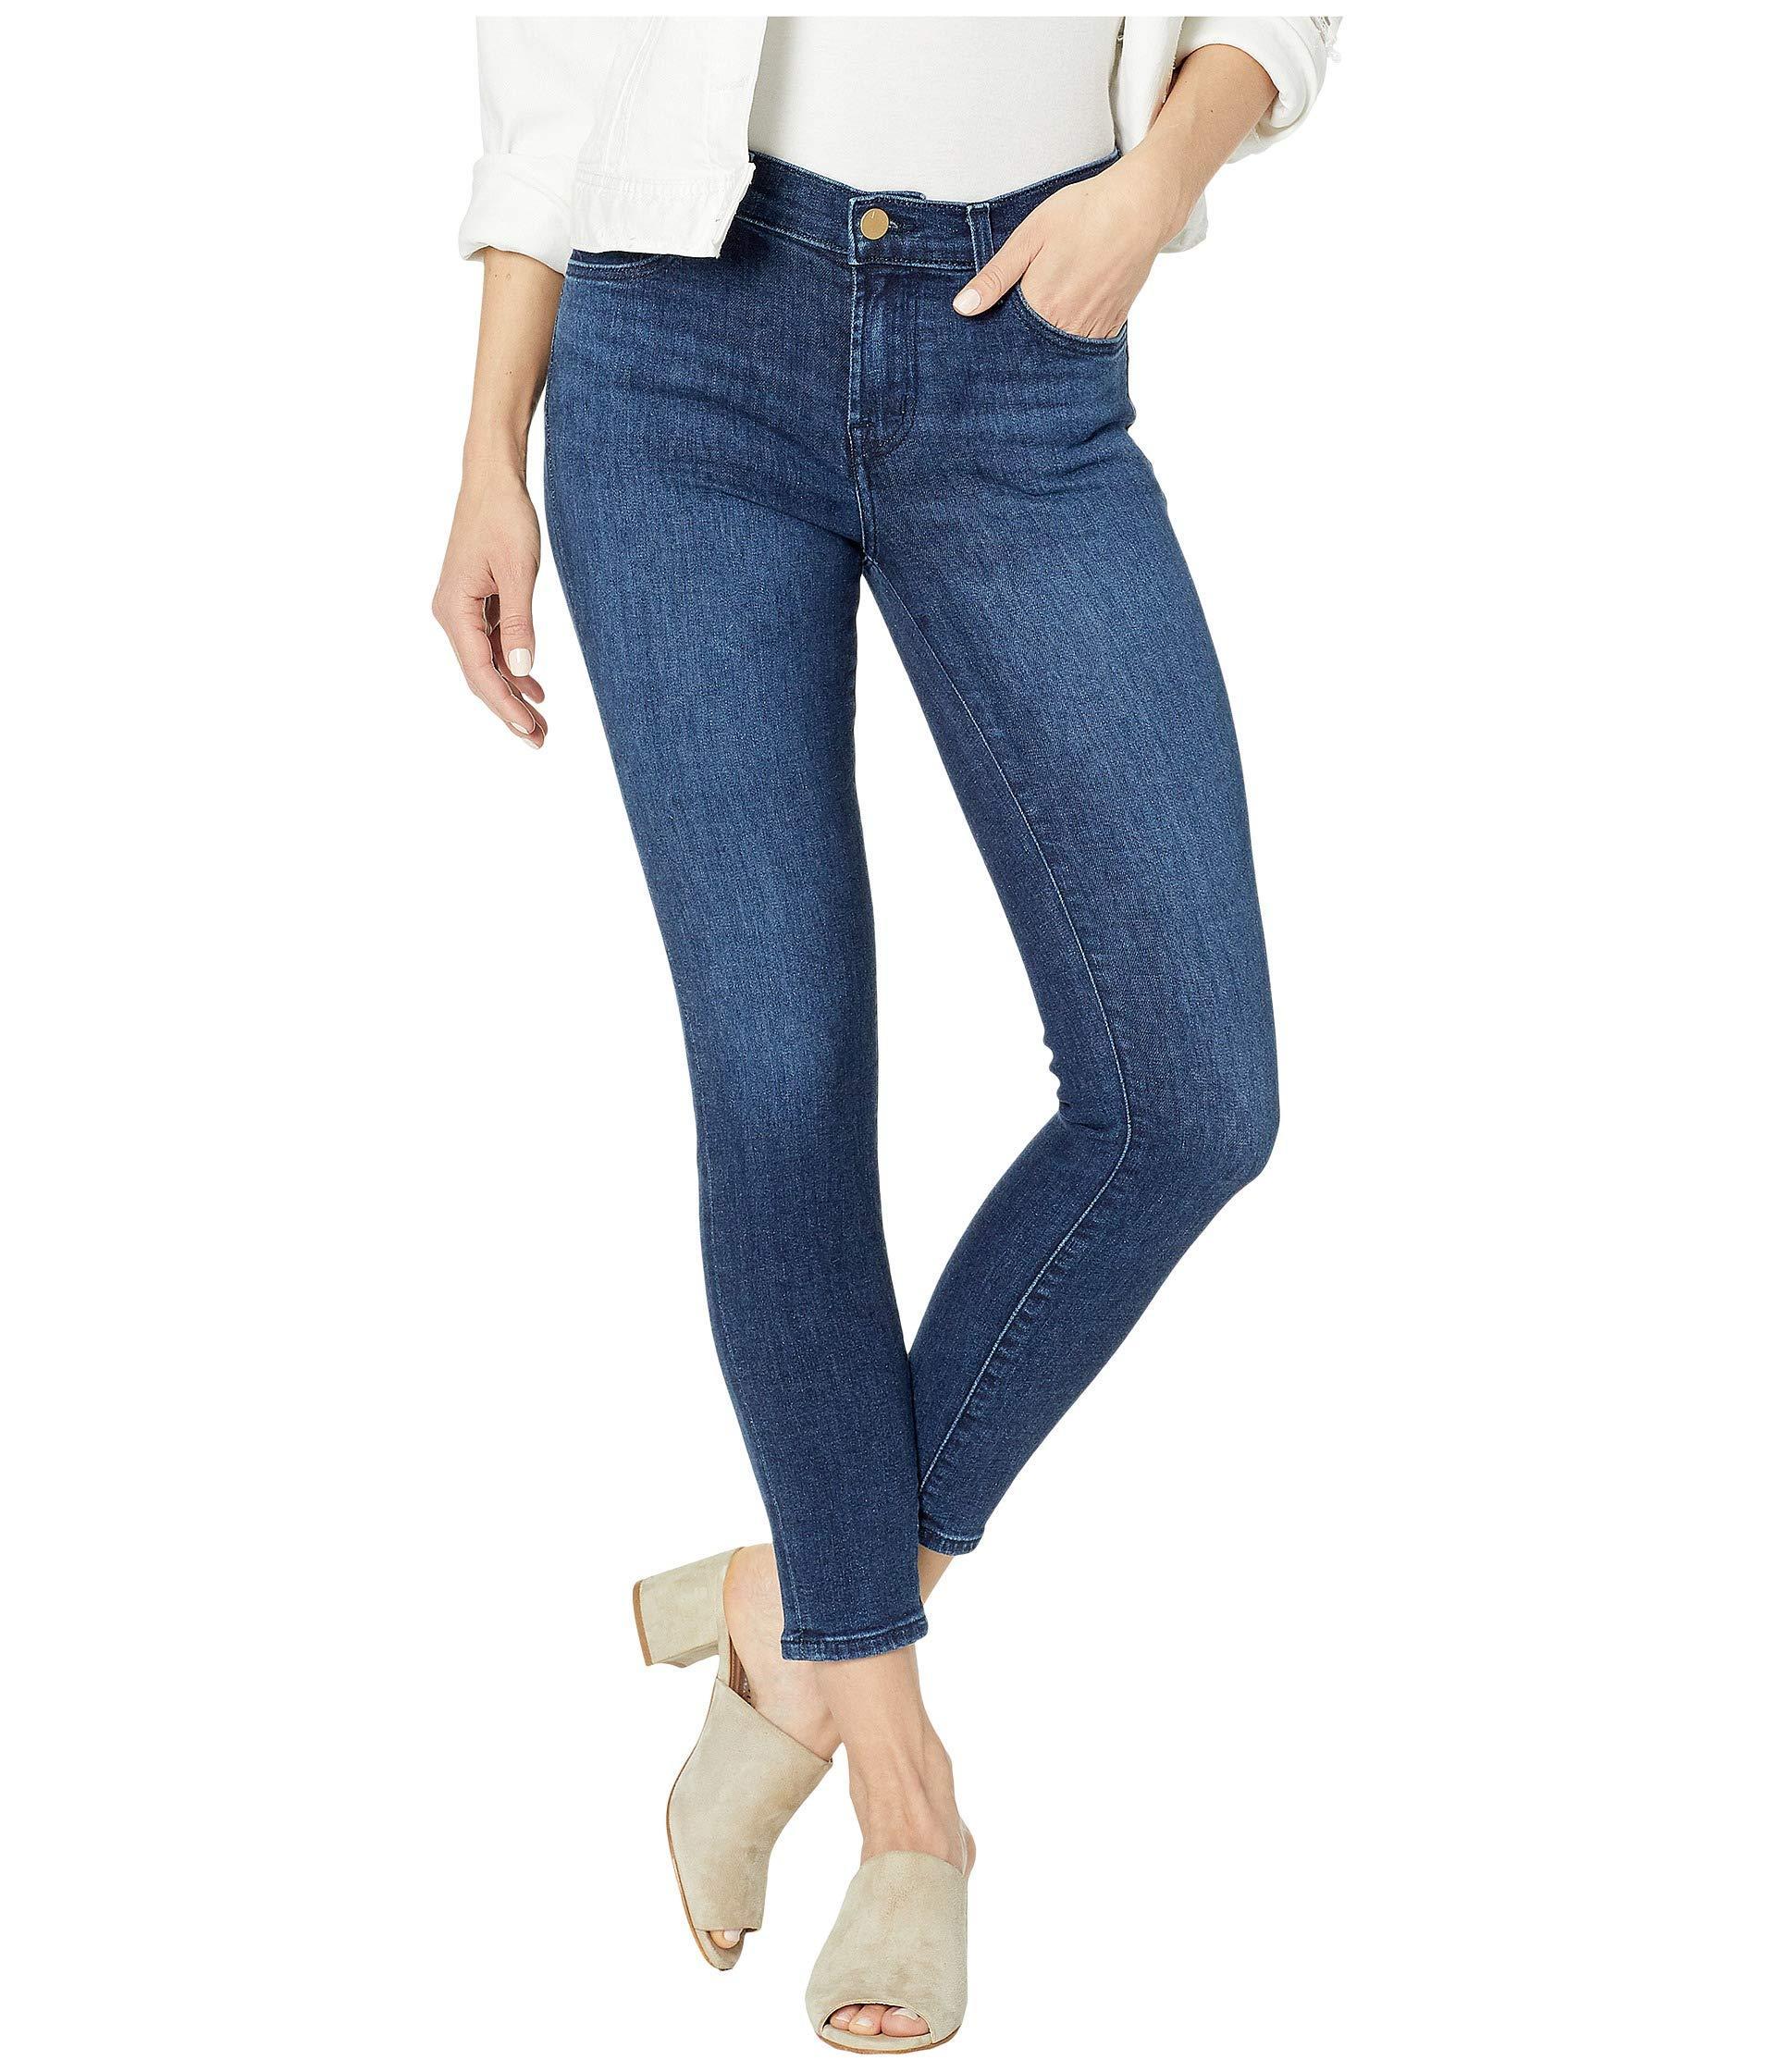 J Brand Jeans Womens 835 Mid Rise Crop Skinny